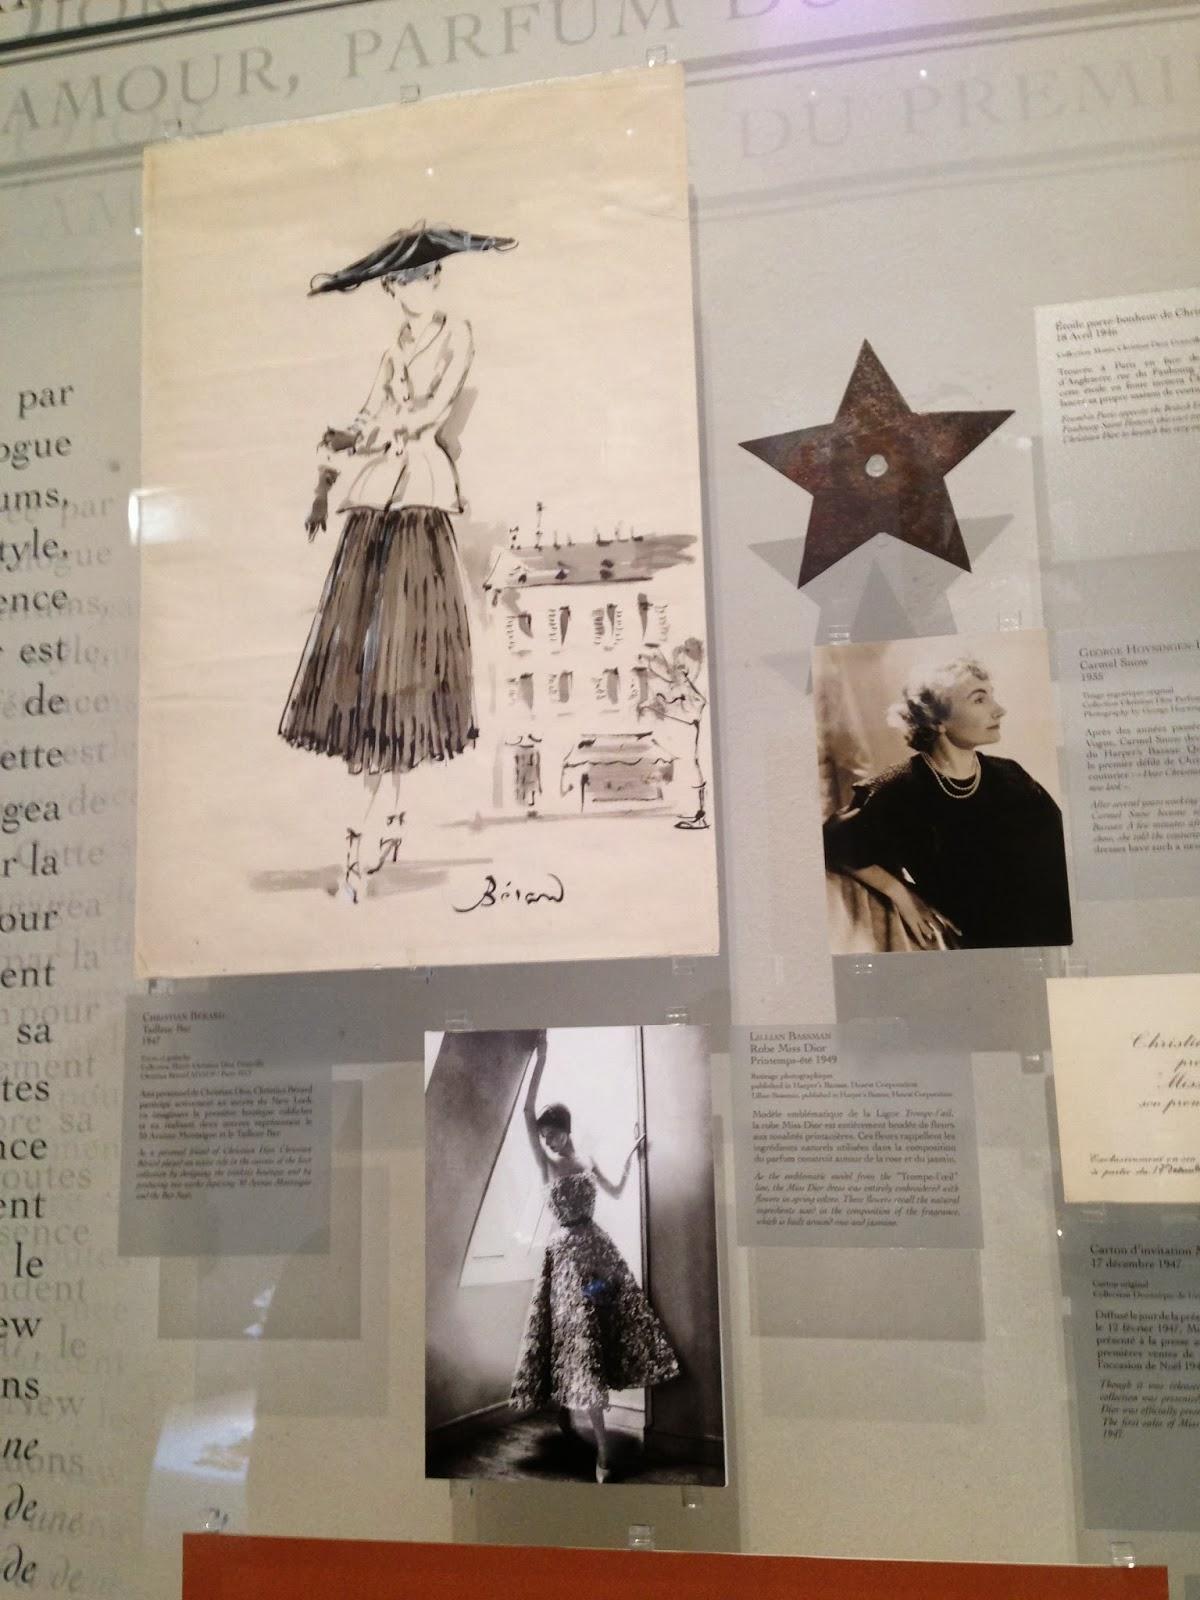 Les Garçons aux Foulards - Exposition Miss Dior 9000e8cdb3f